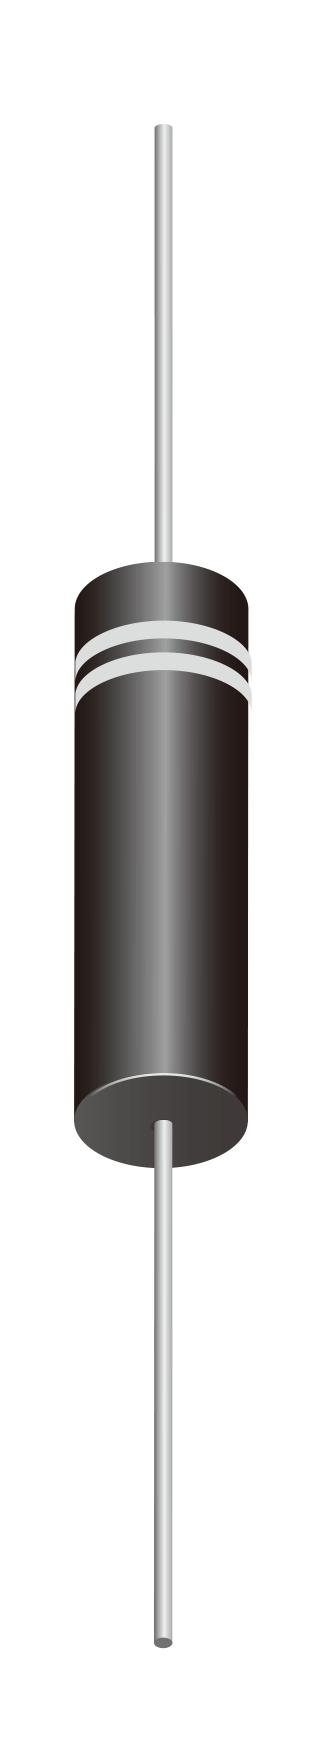 2cl105